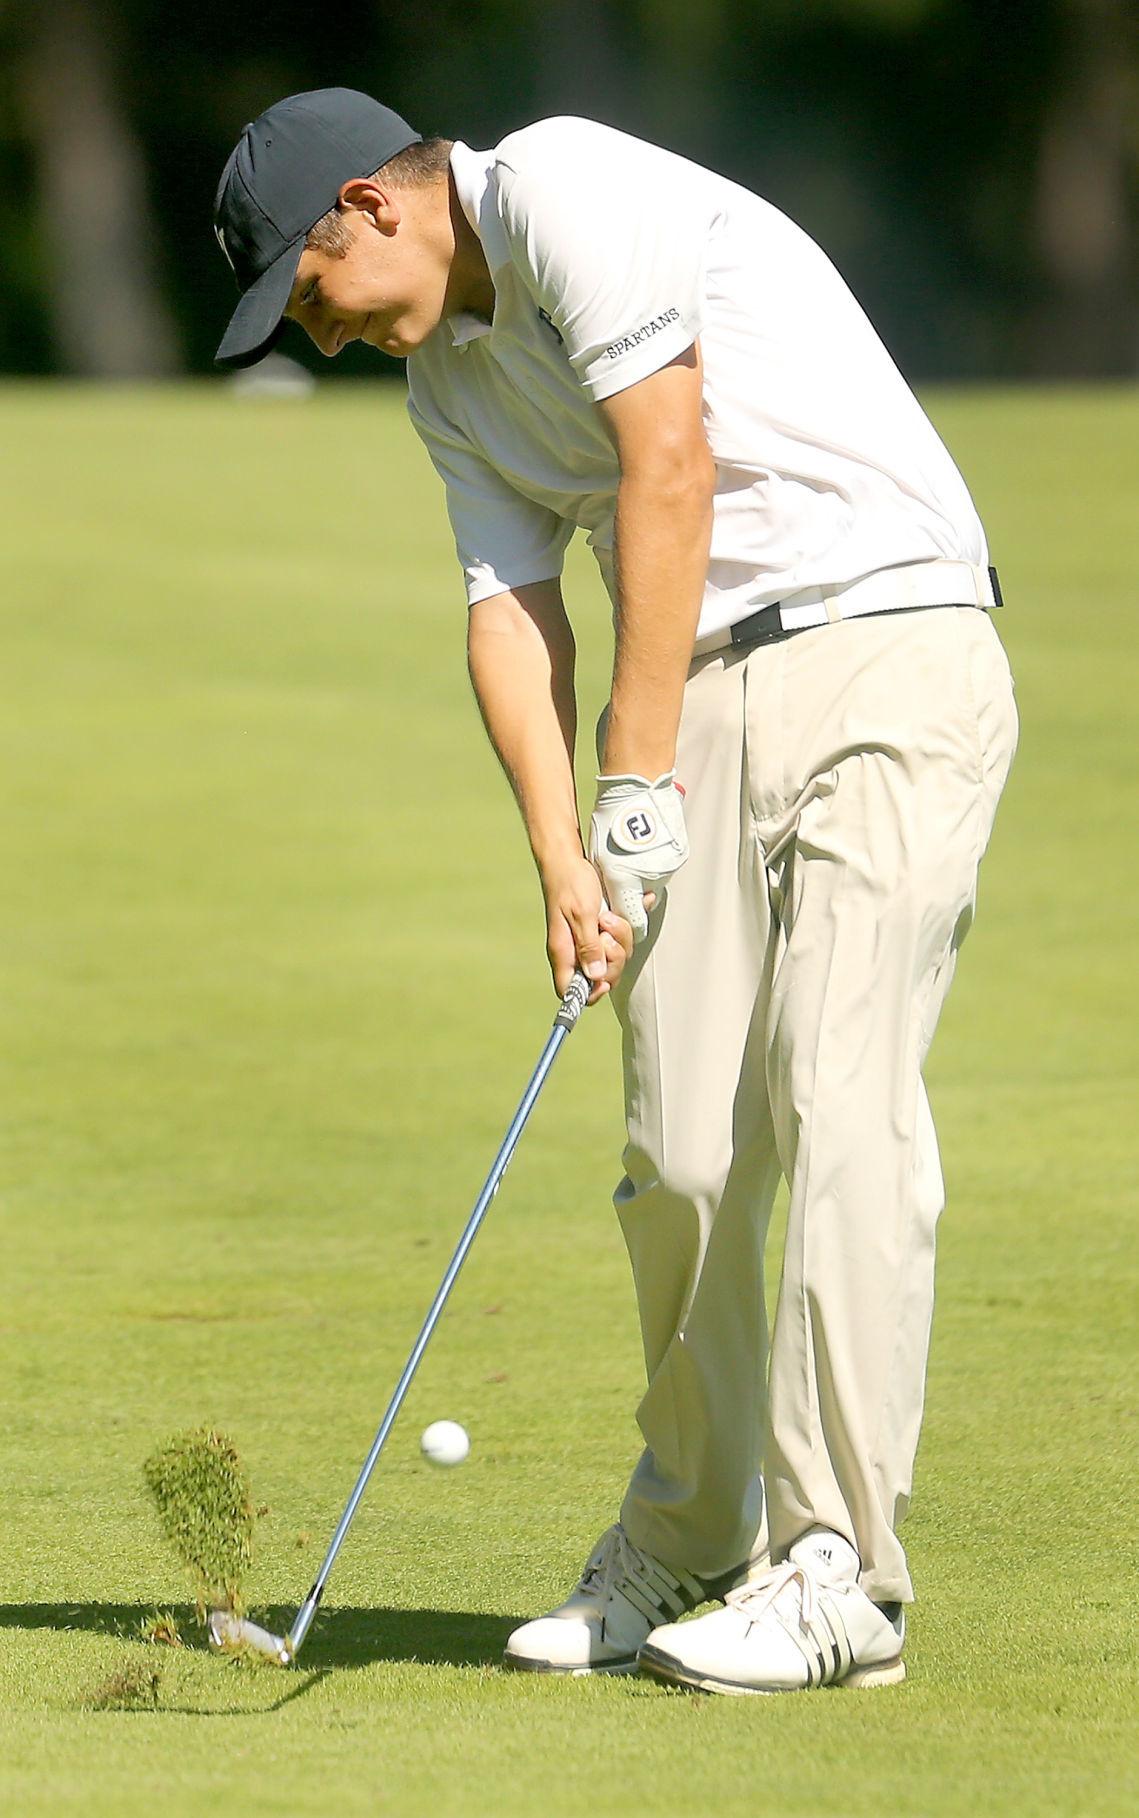 091118-spt-boys-golf-011